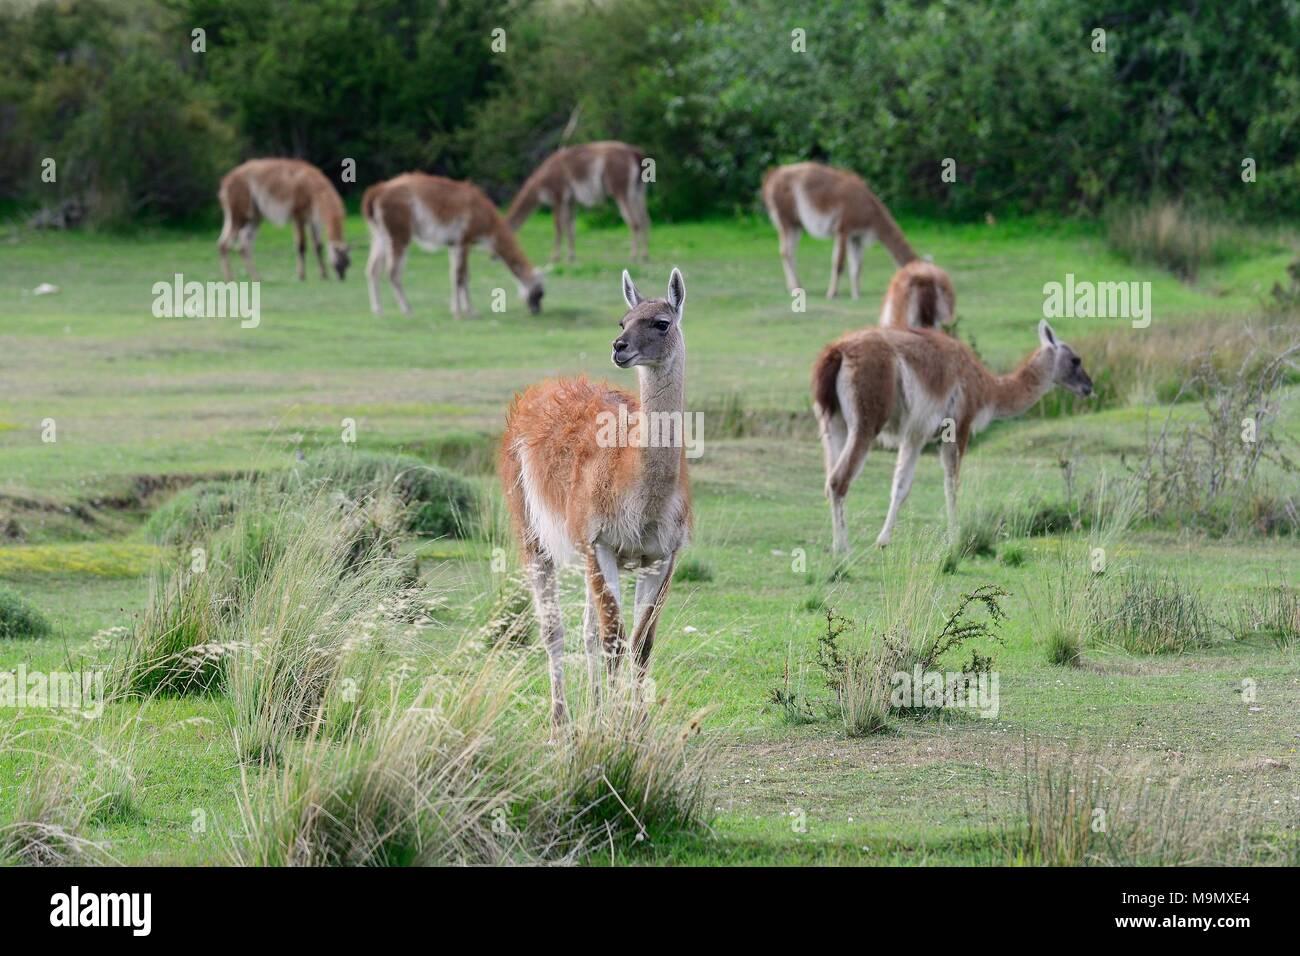 Troupeau de guanacos (Lama guanicoe), Valle Chacabuco, Región de Aysén, Chili Banque D'Images